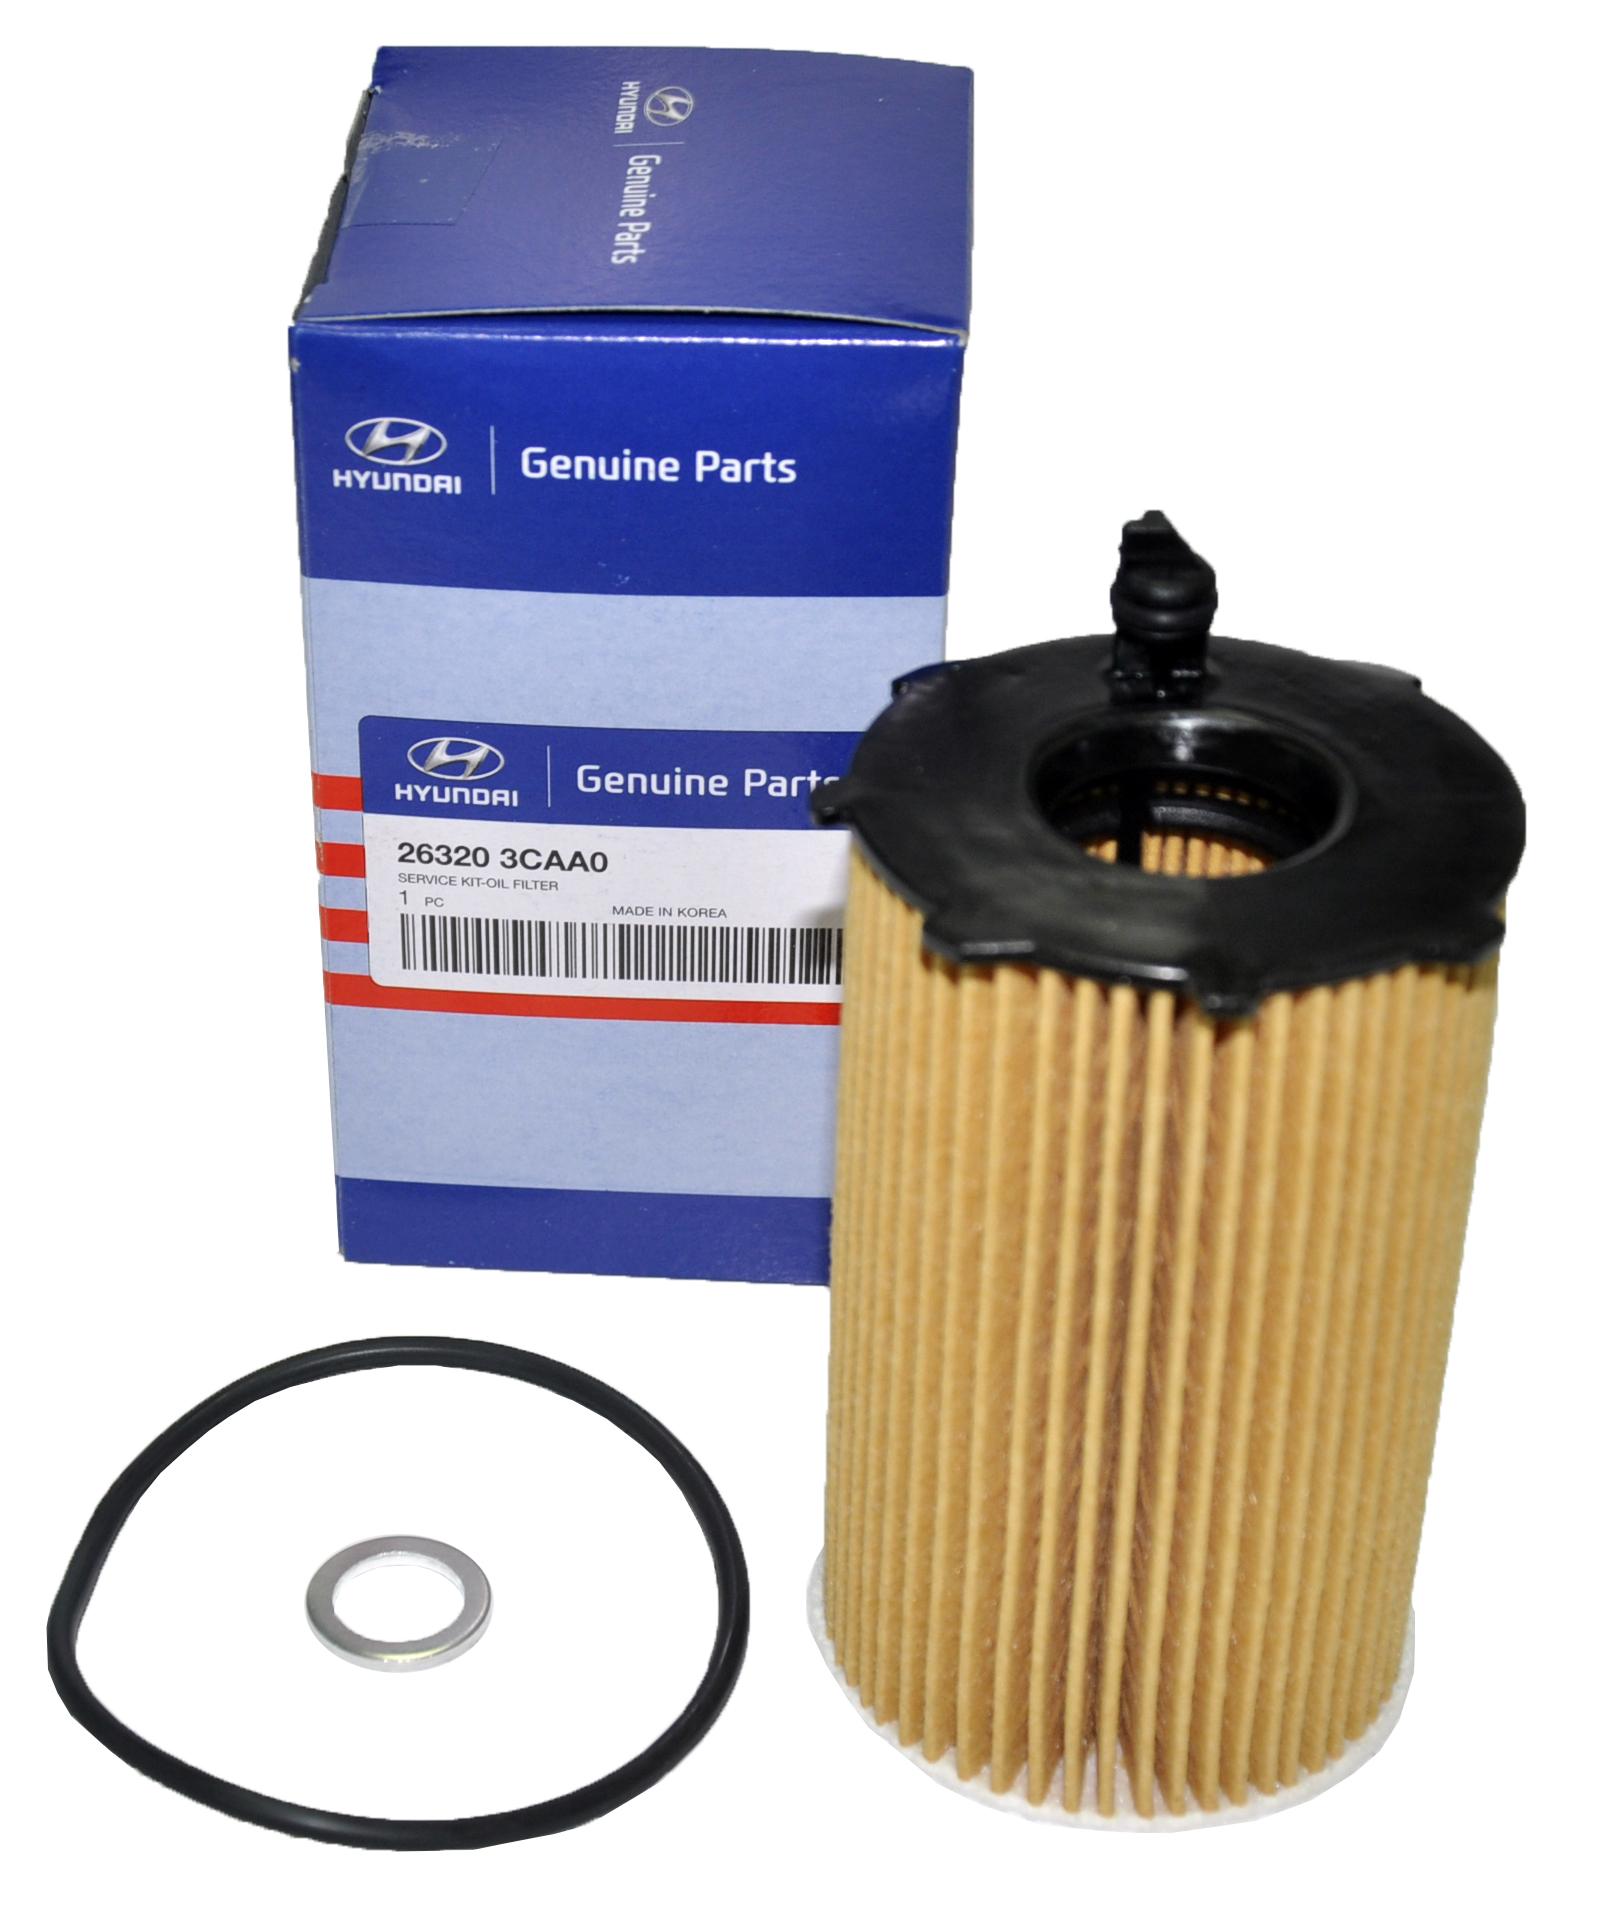 New Genuine Oem For Hyundai Kia Oil Filter 26320 3caa0 Ebay